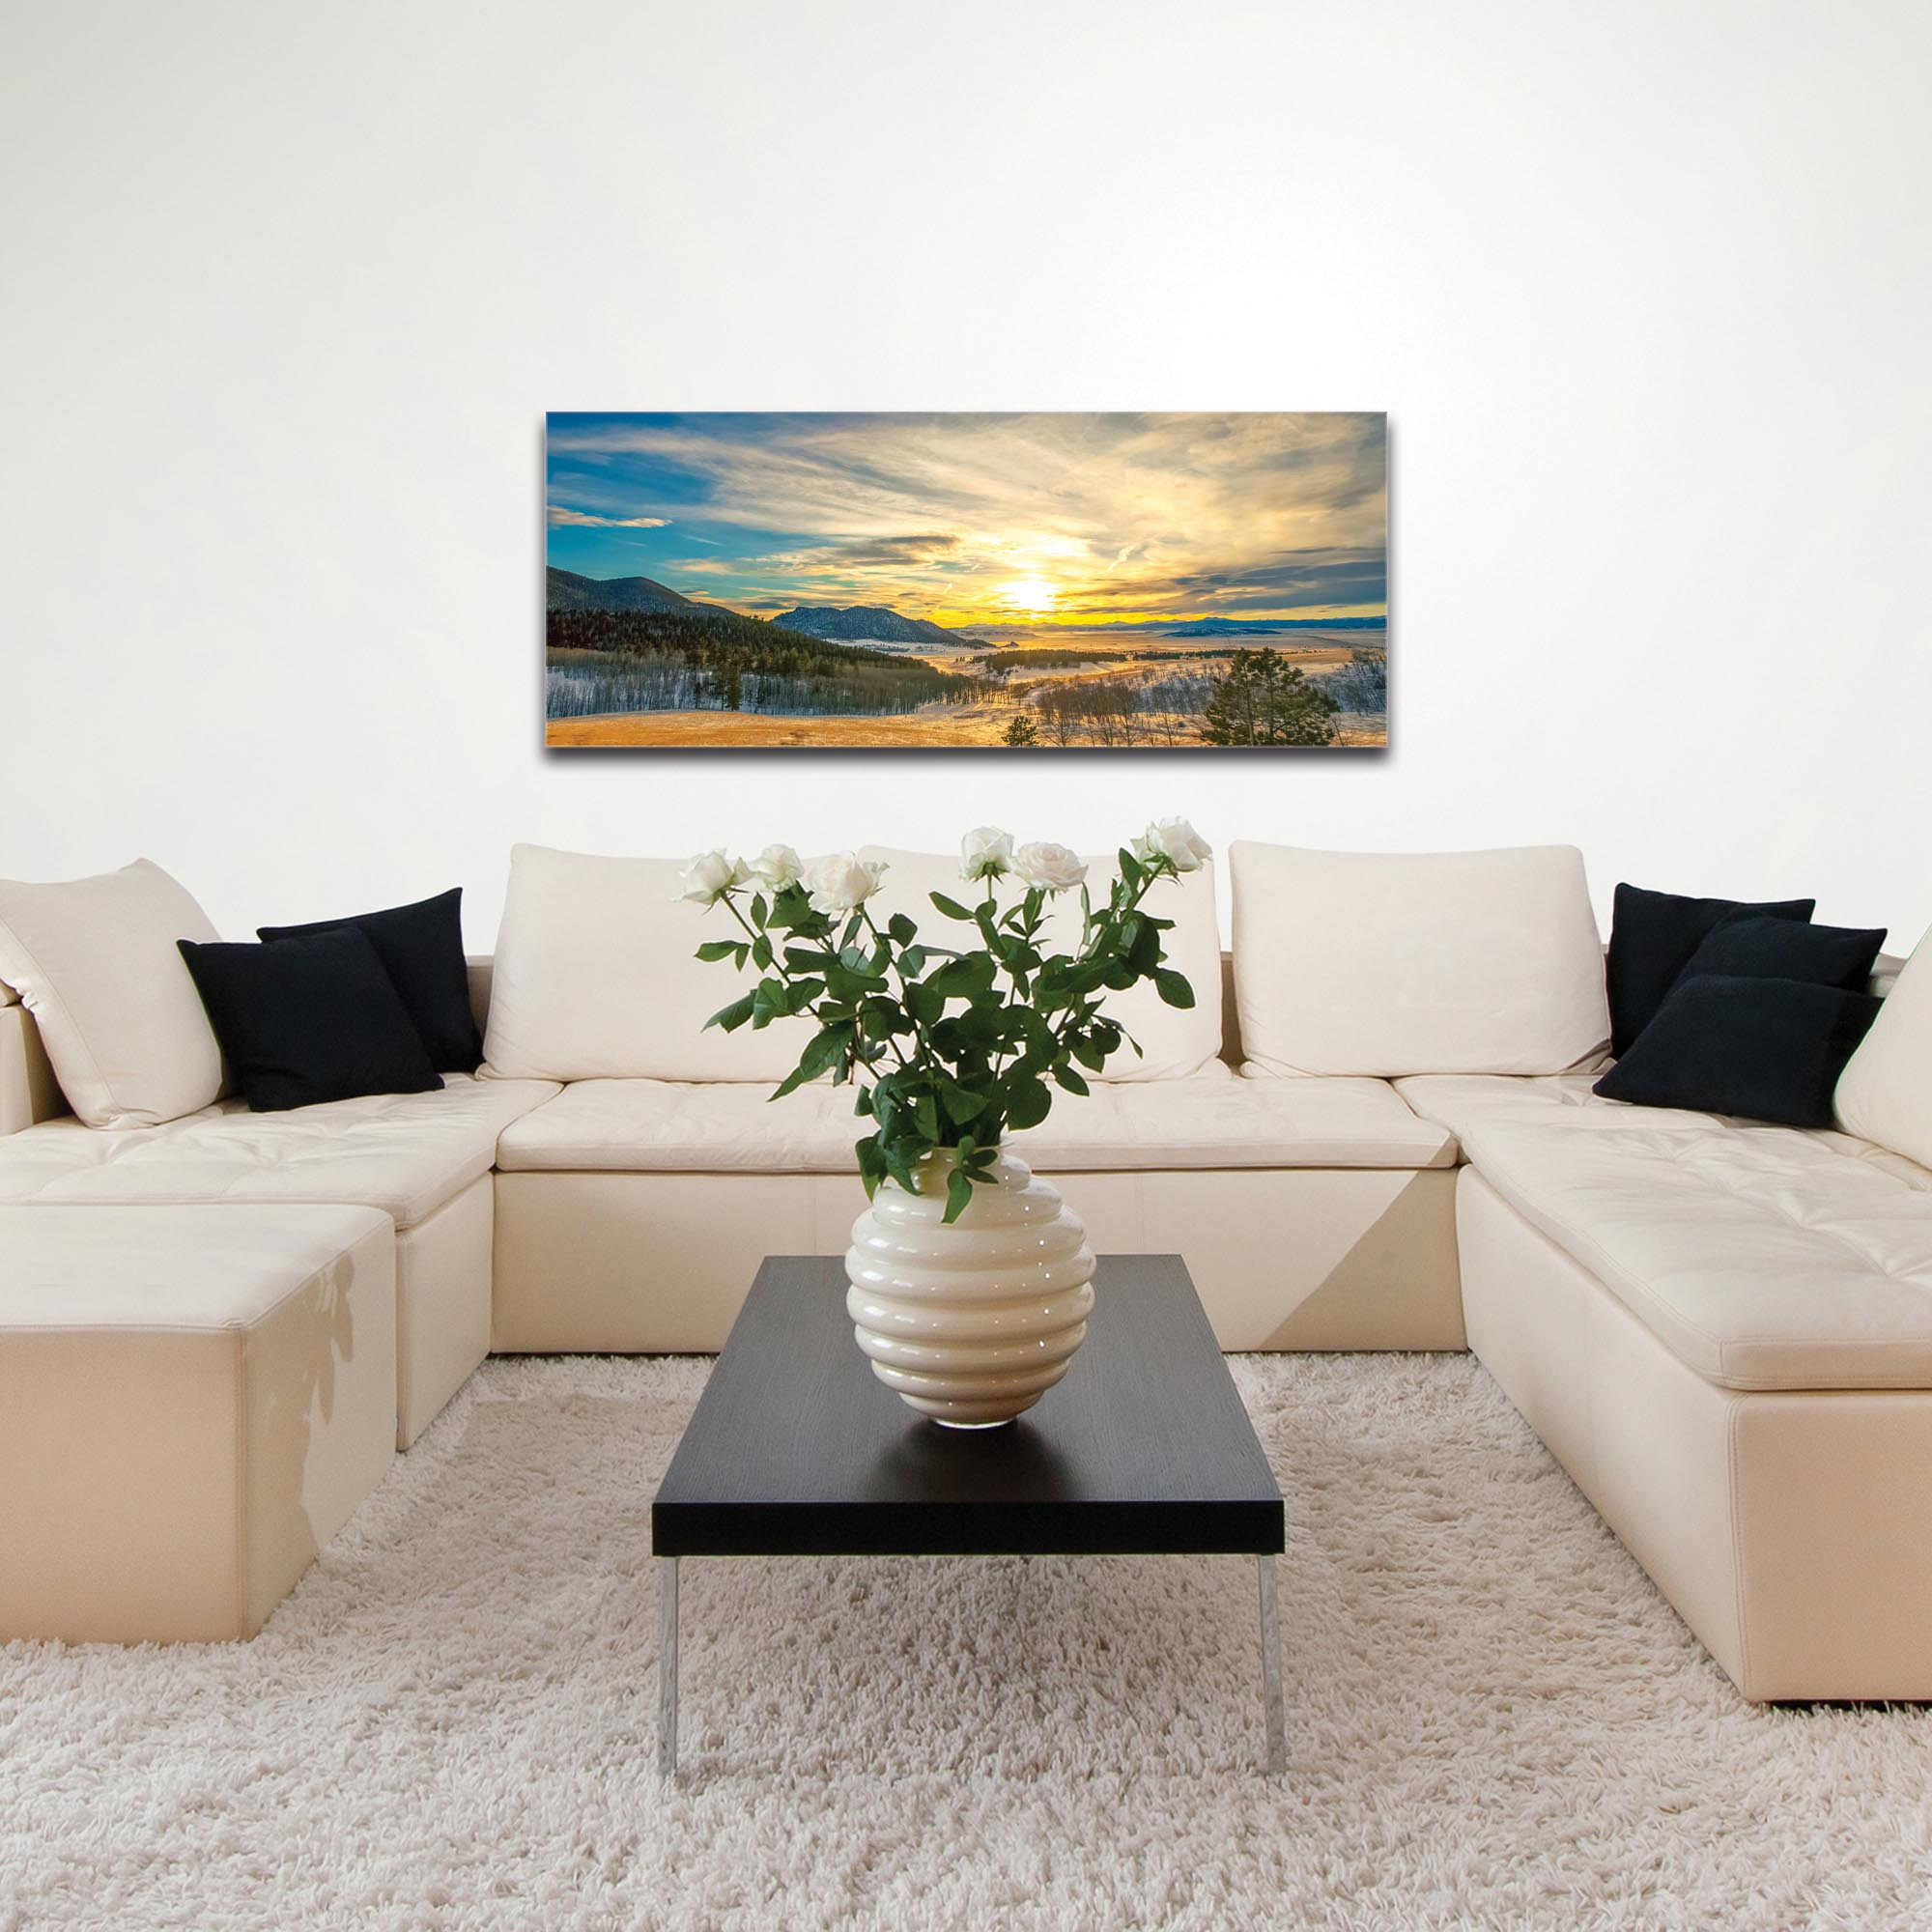 Landscape Photography 'Brisk Sunset' - Winter Sunset Art on Metal or Plexiglass - Image 3